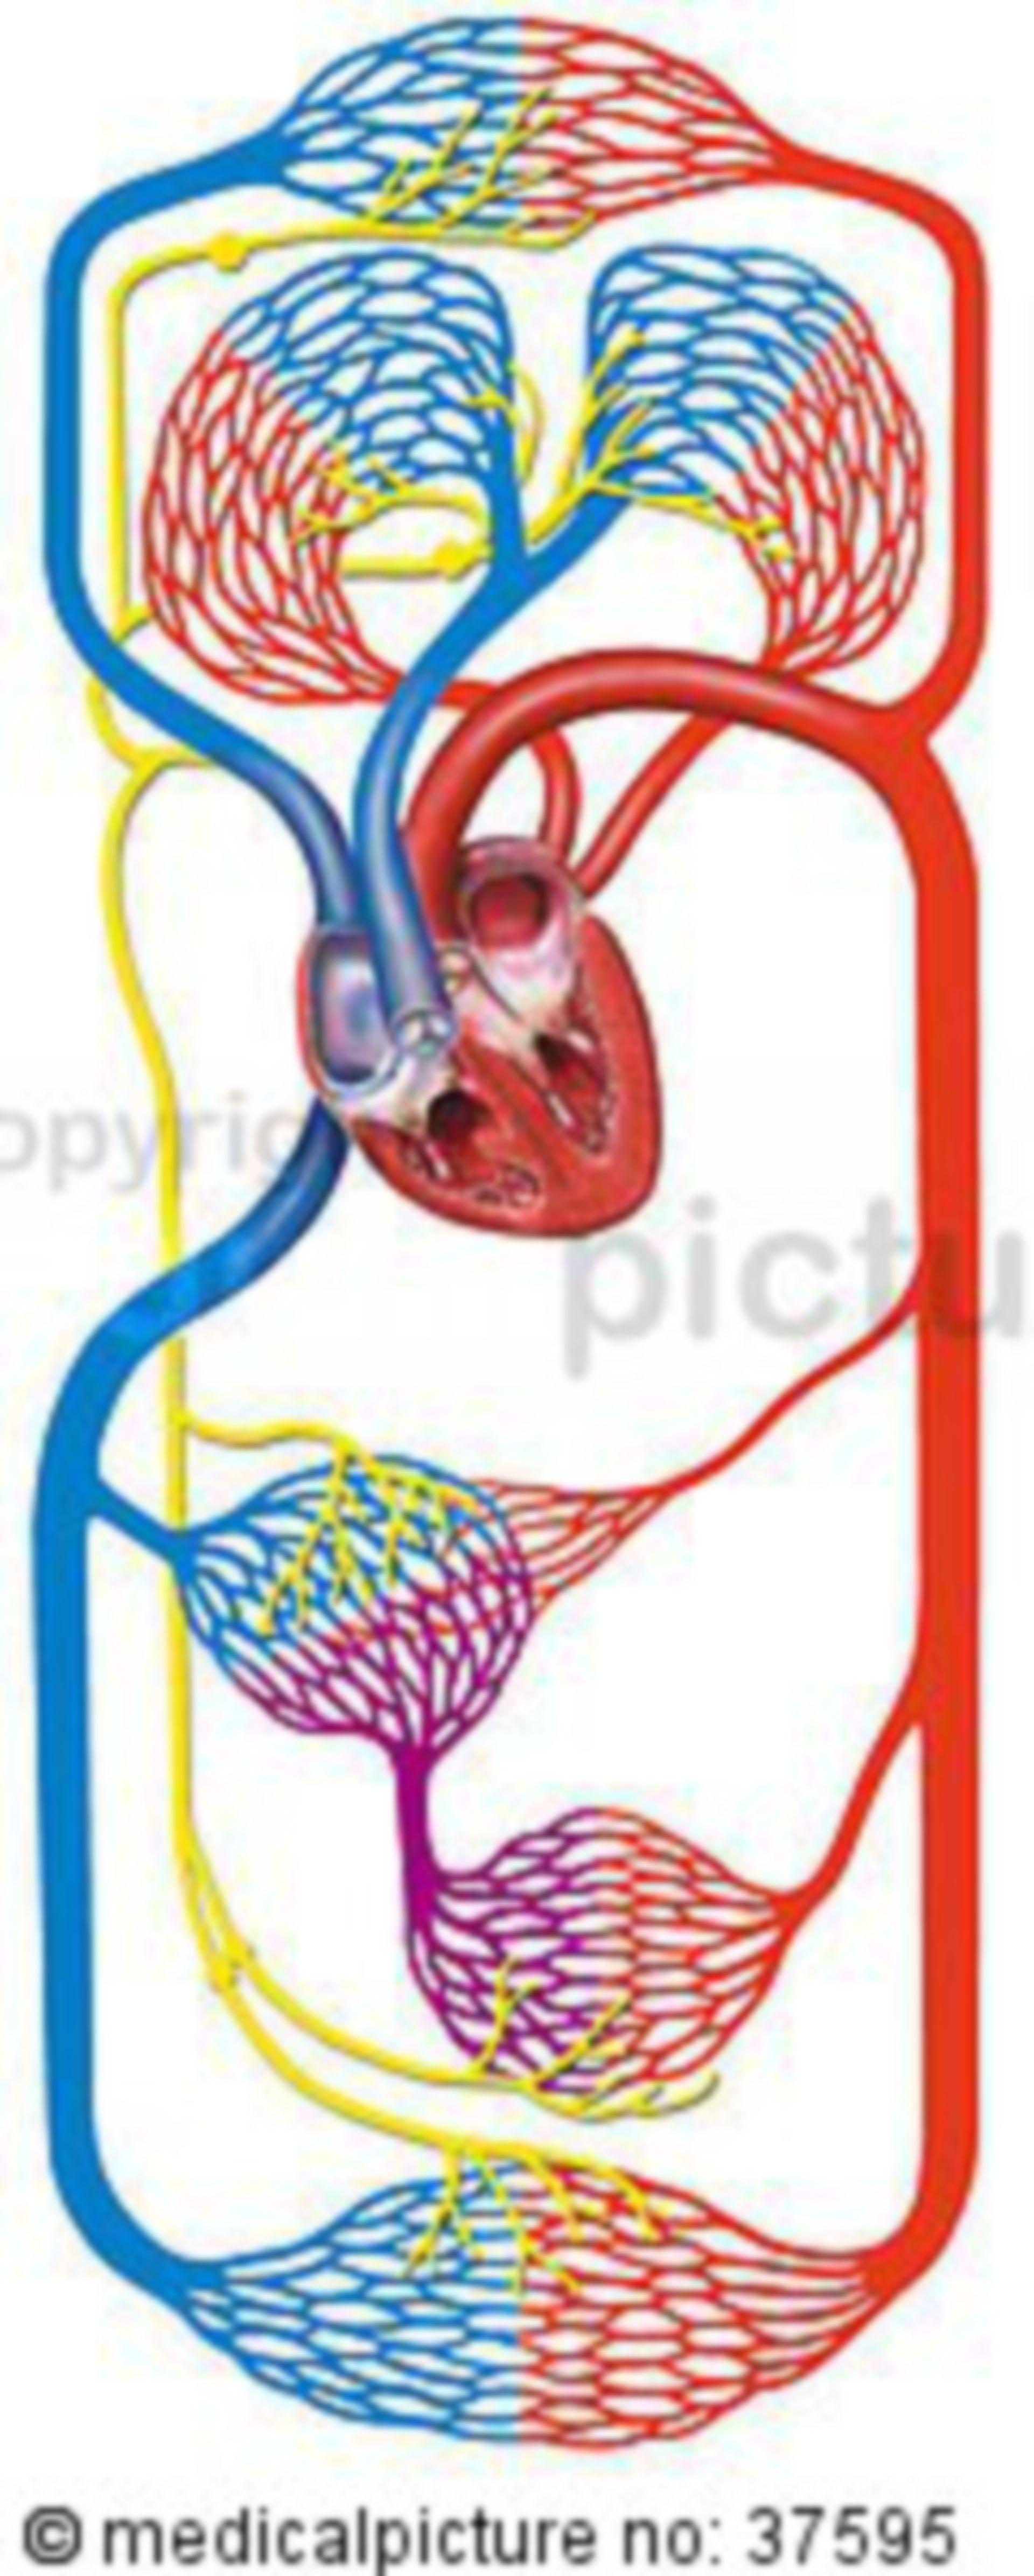 The human blood circulation